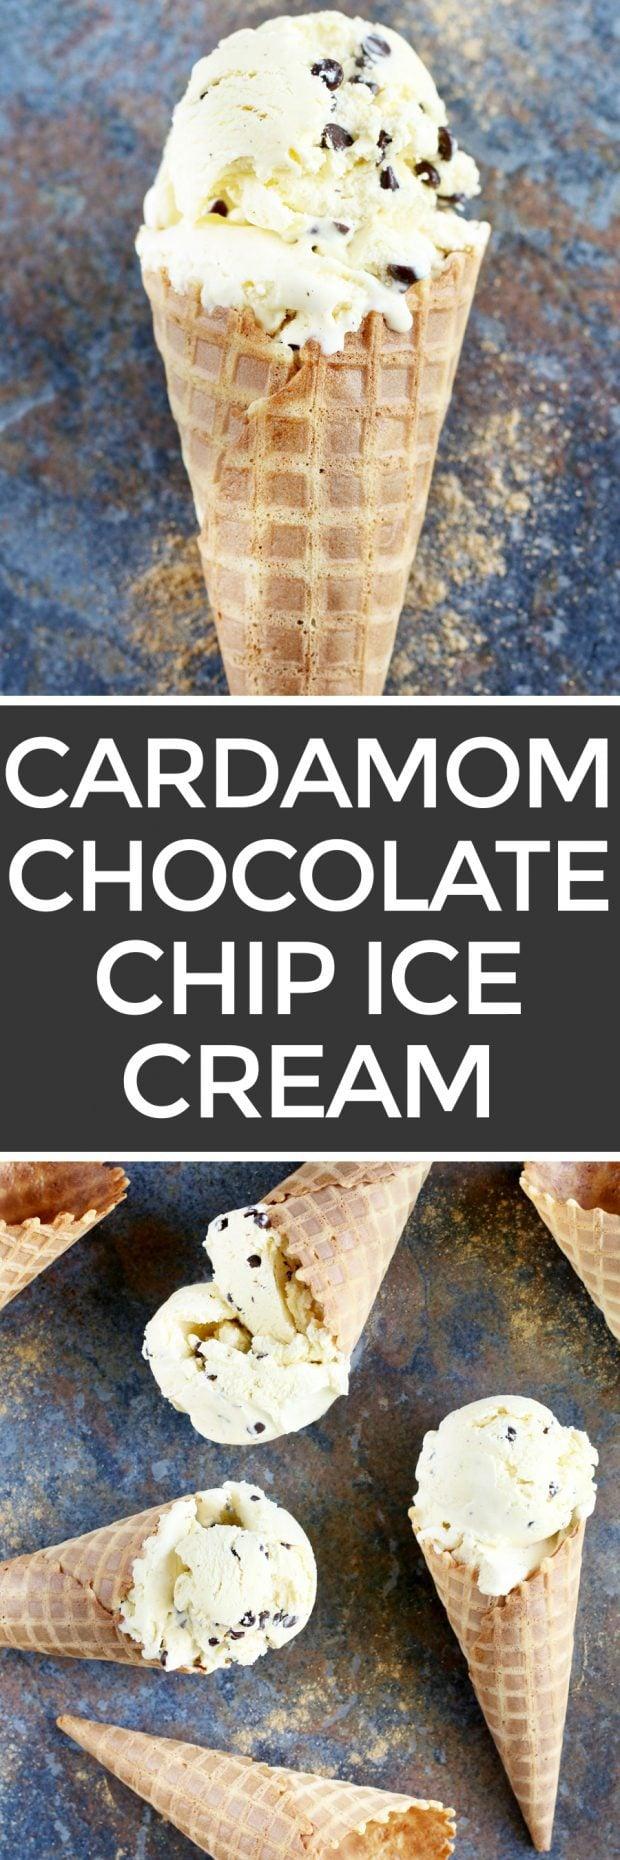 Chocolate Chip Cardamom Ice Cream